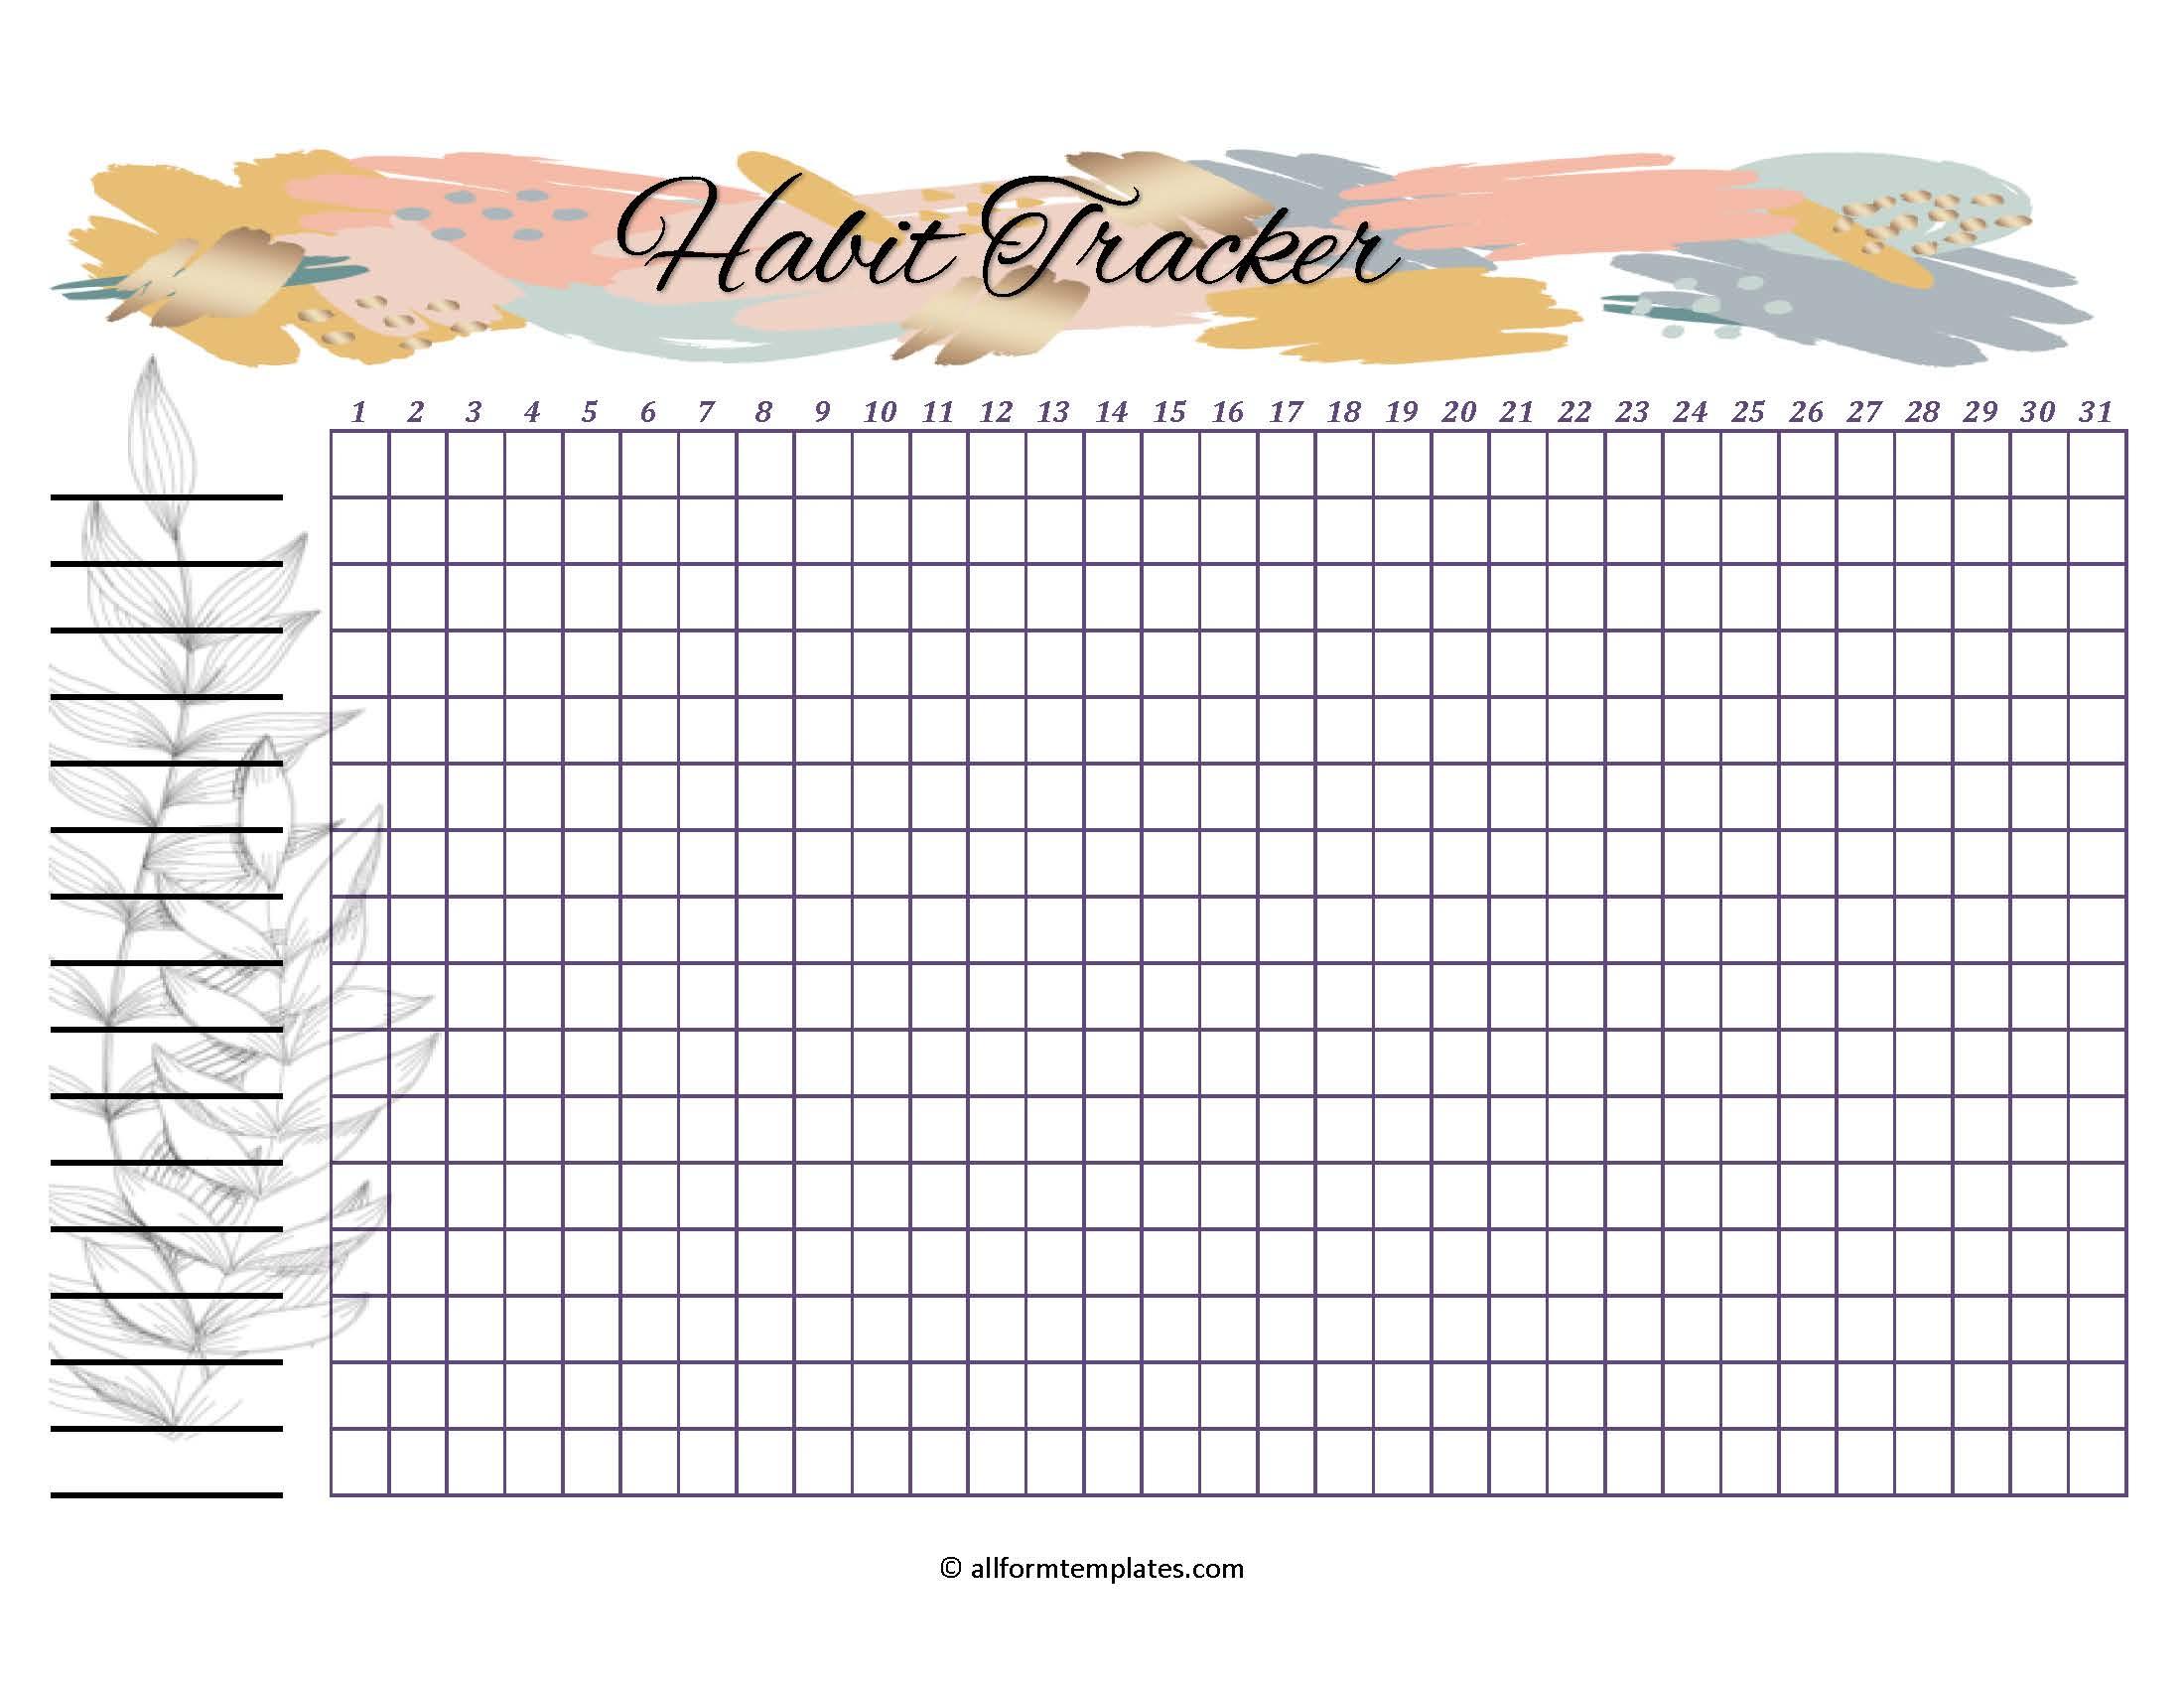 Habit-Tracker-4